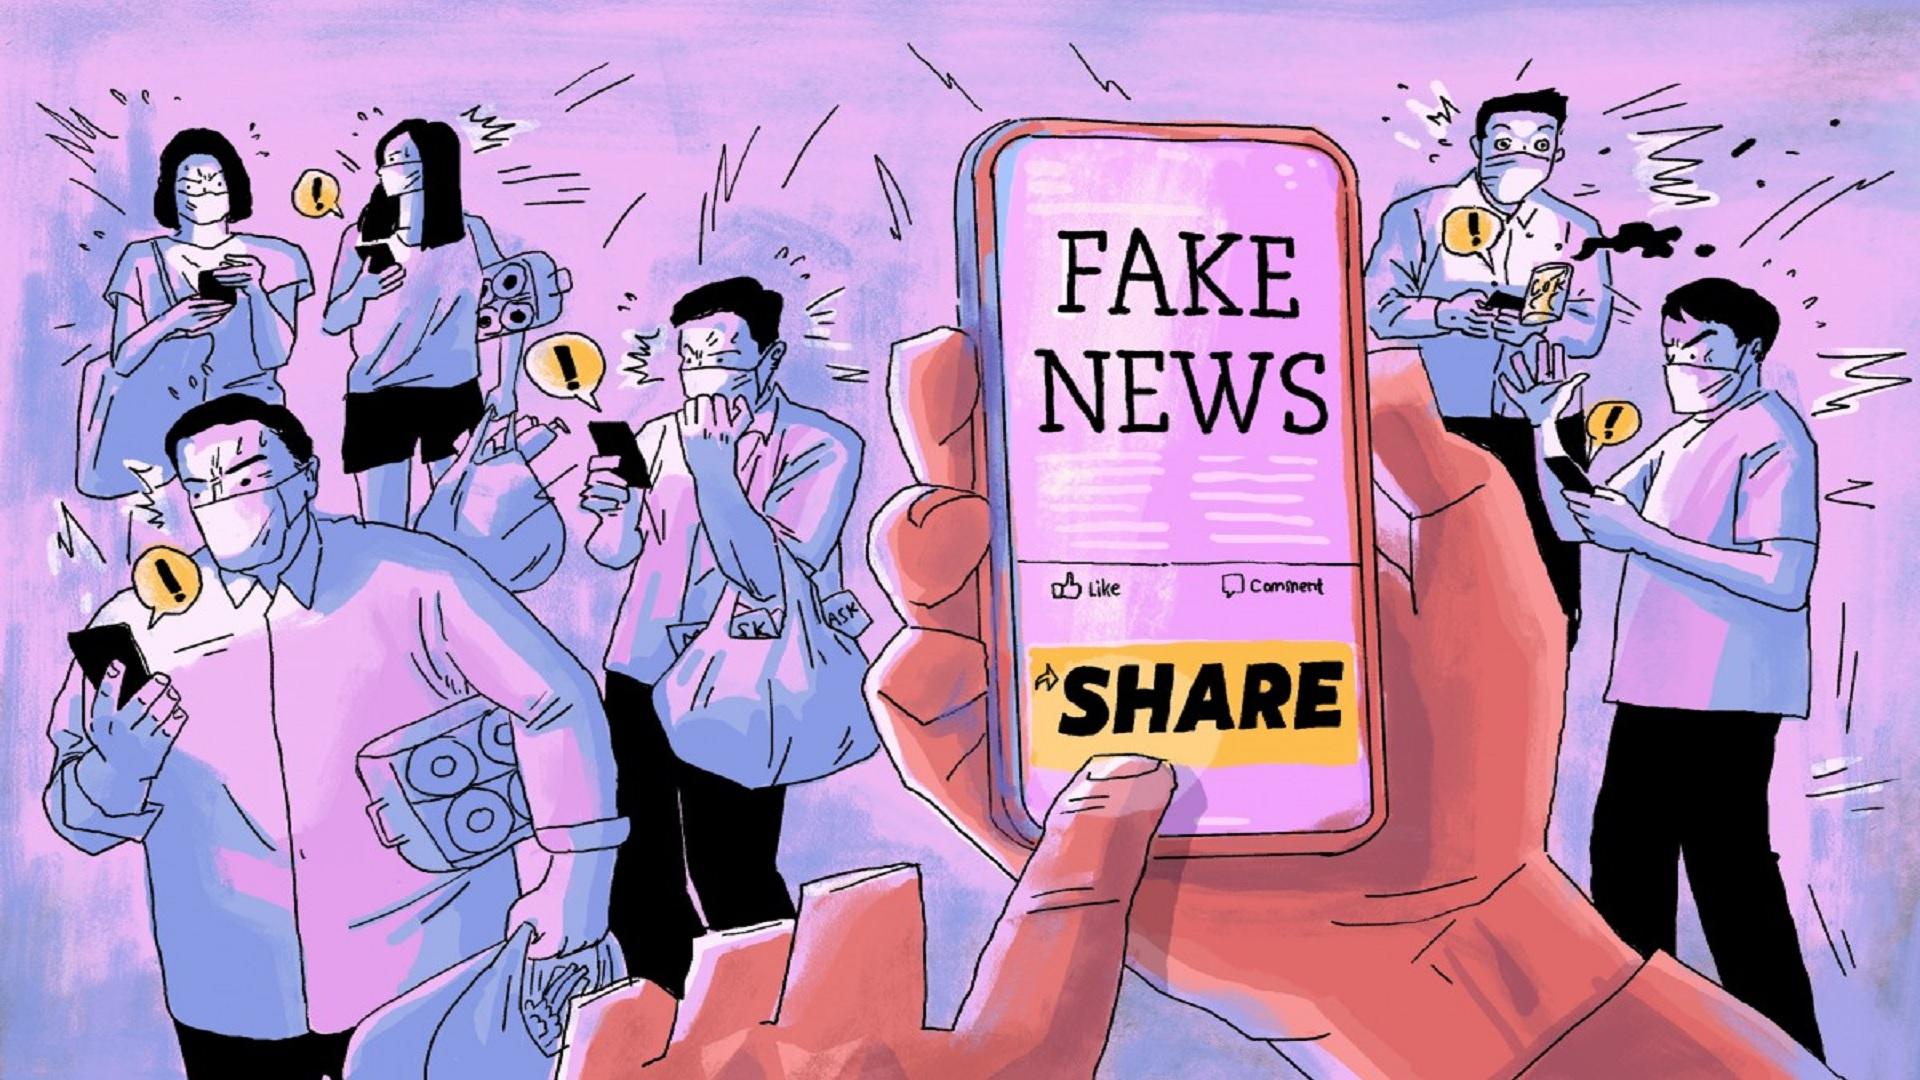 Fake News: Το Γαλλικό Πρακτορείο Ειδήσεων ως ελεγκτής για Ελλάδα και Κύπρο